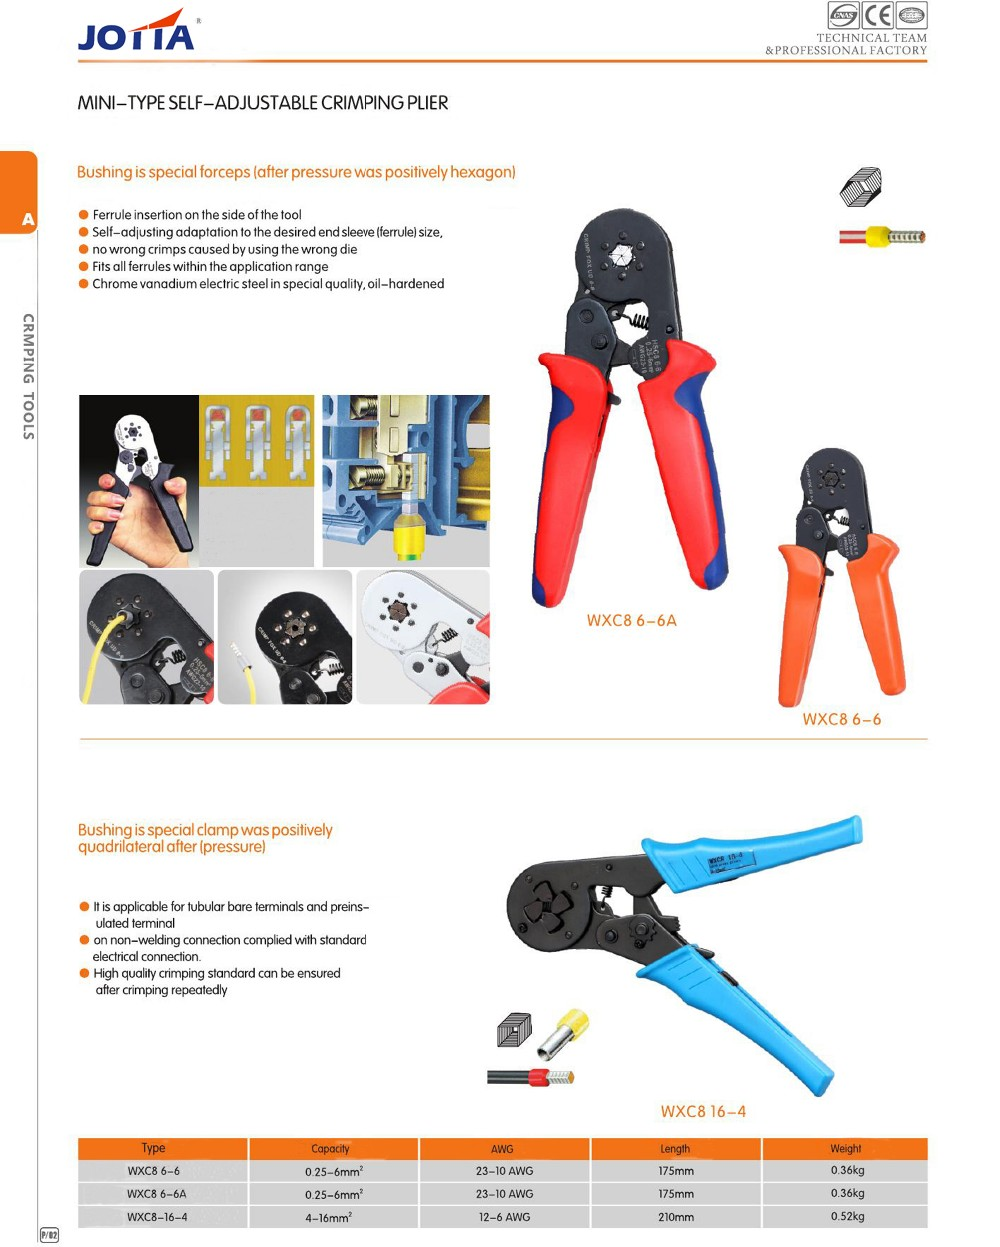 Mini Self-Adjustable Crimping Plier4 A